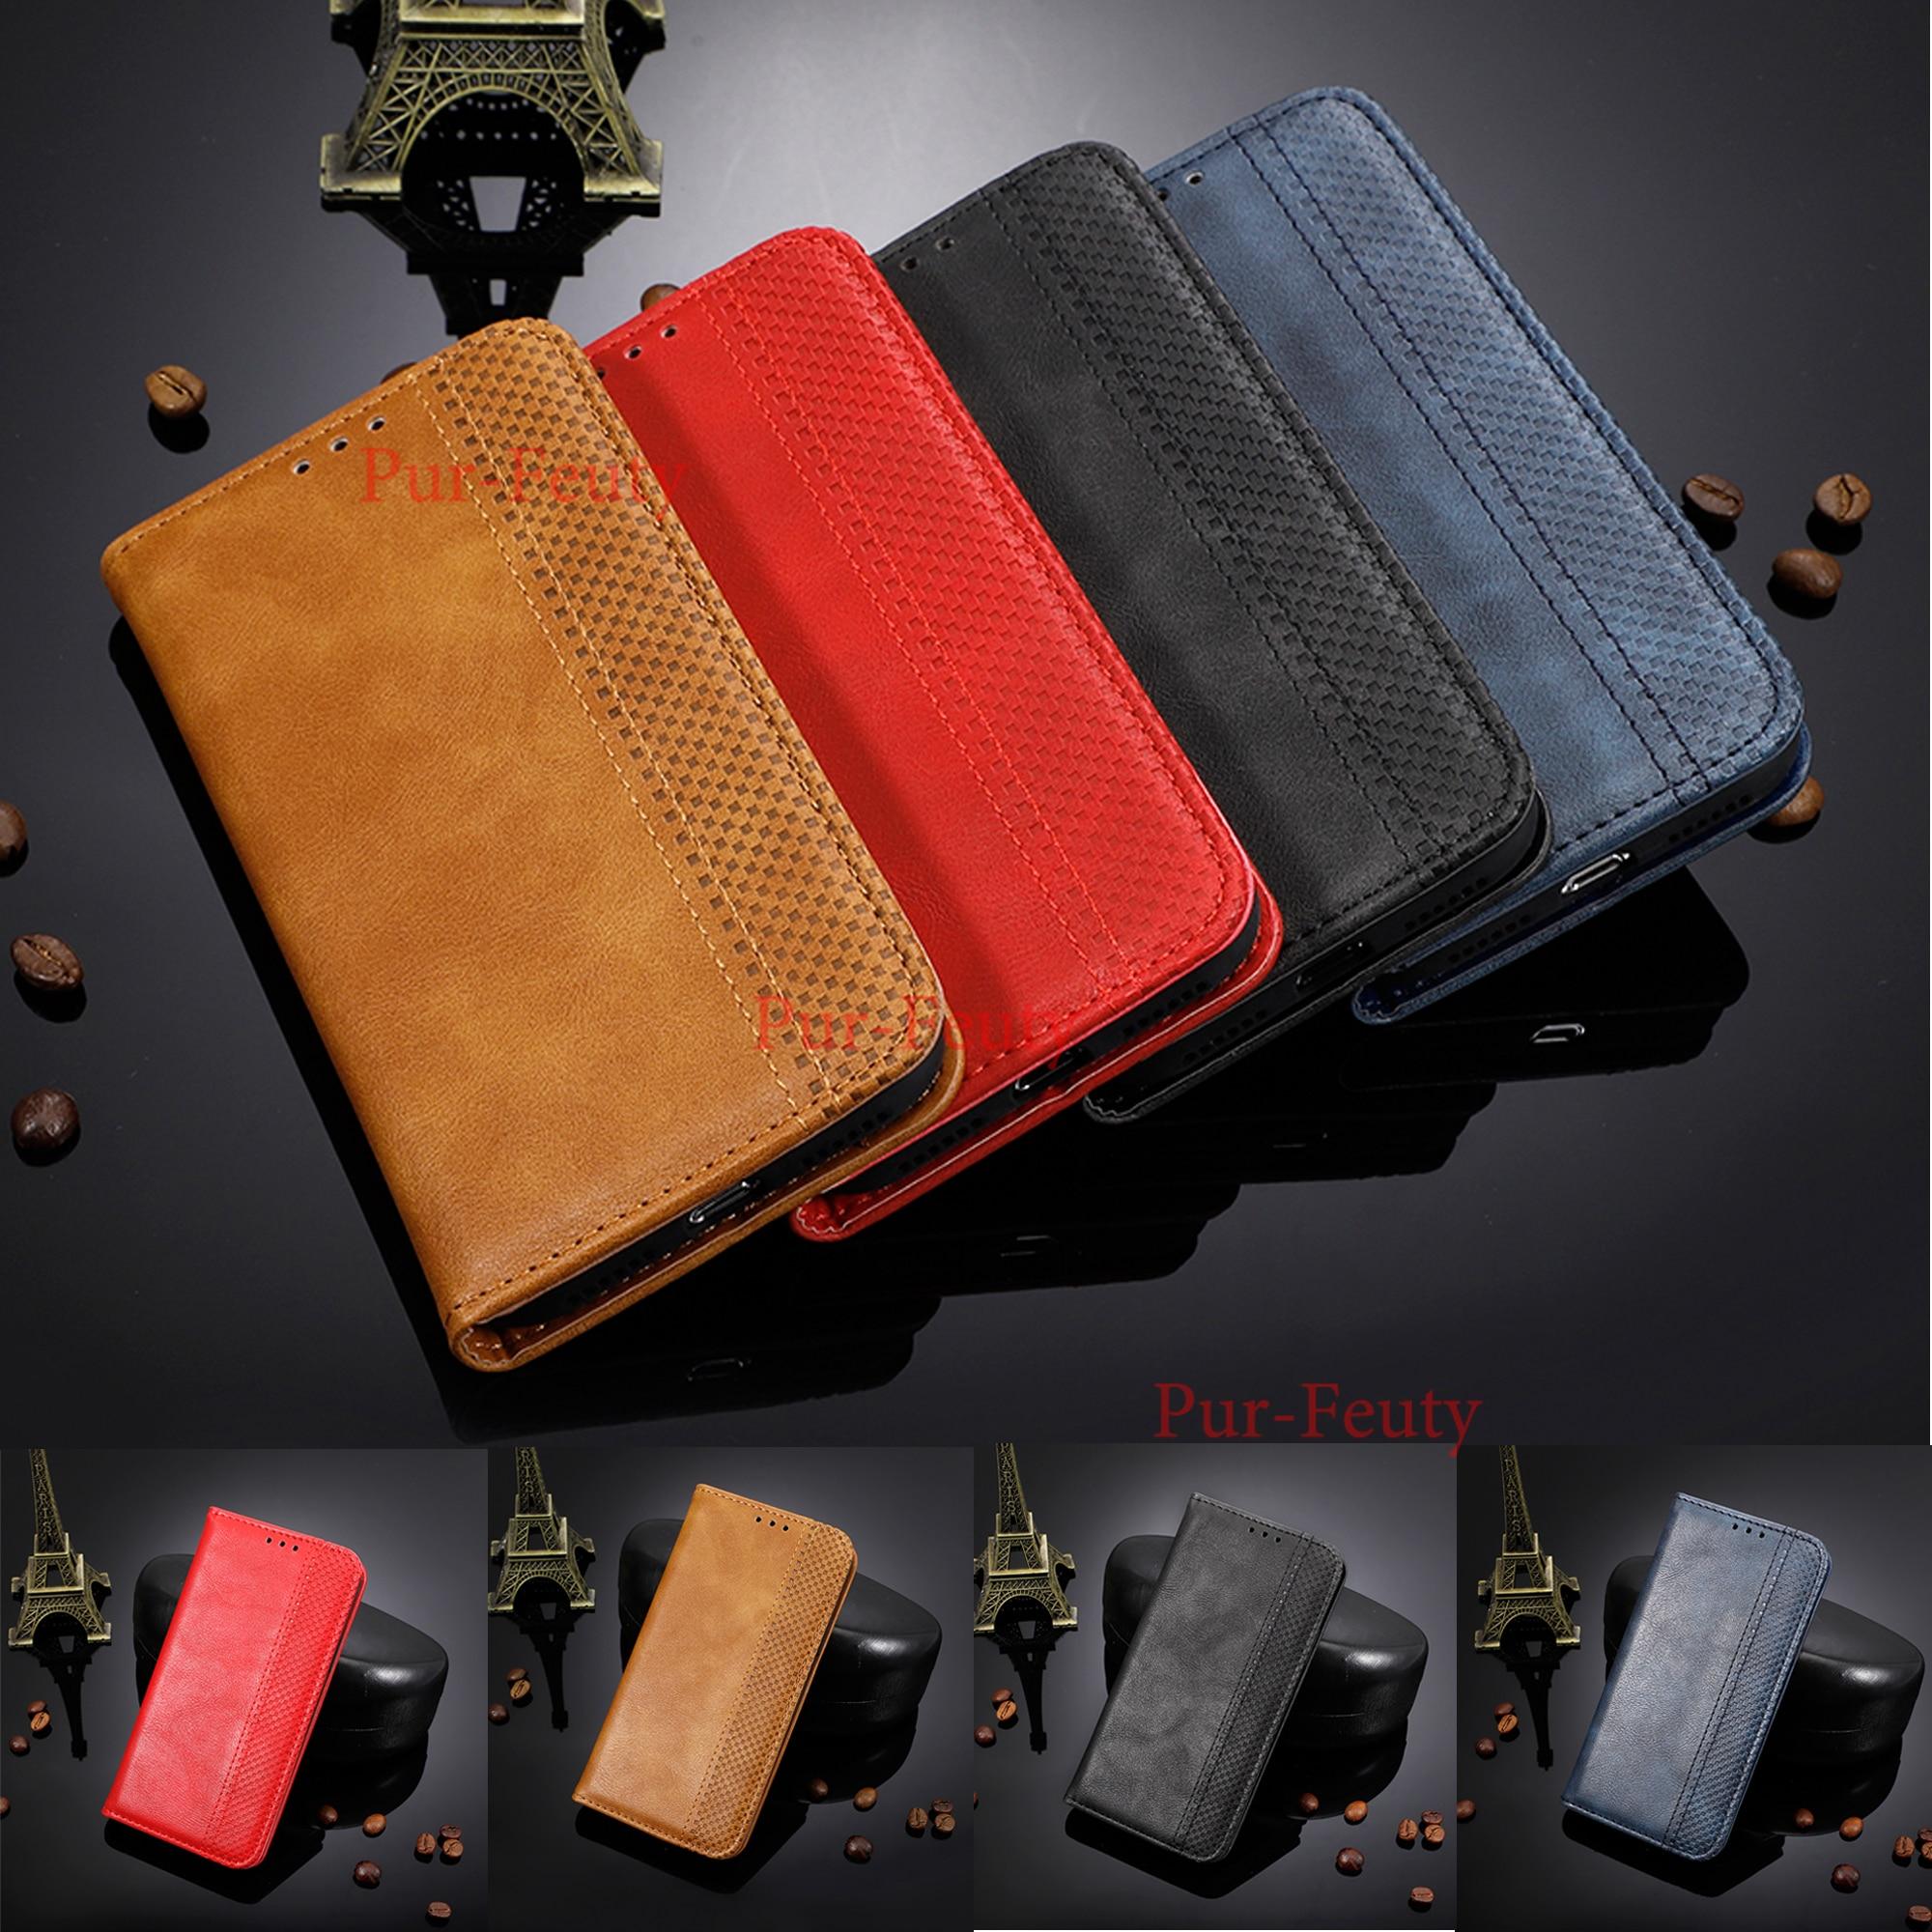 Wallet Shell For LG W30 LMX440IM W10 K50 Q60 Stylo 5 G8 G8S K30 K20 X2 2019 V50S G8S G8 G7 V50 Thinq Flip Magnetic Leather Cover